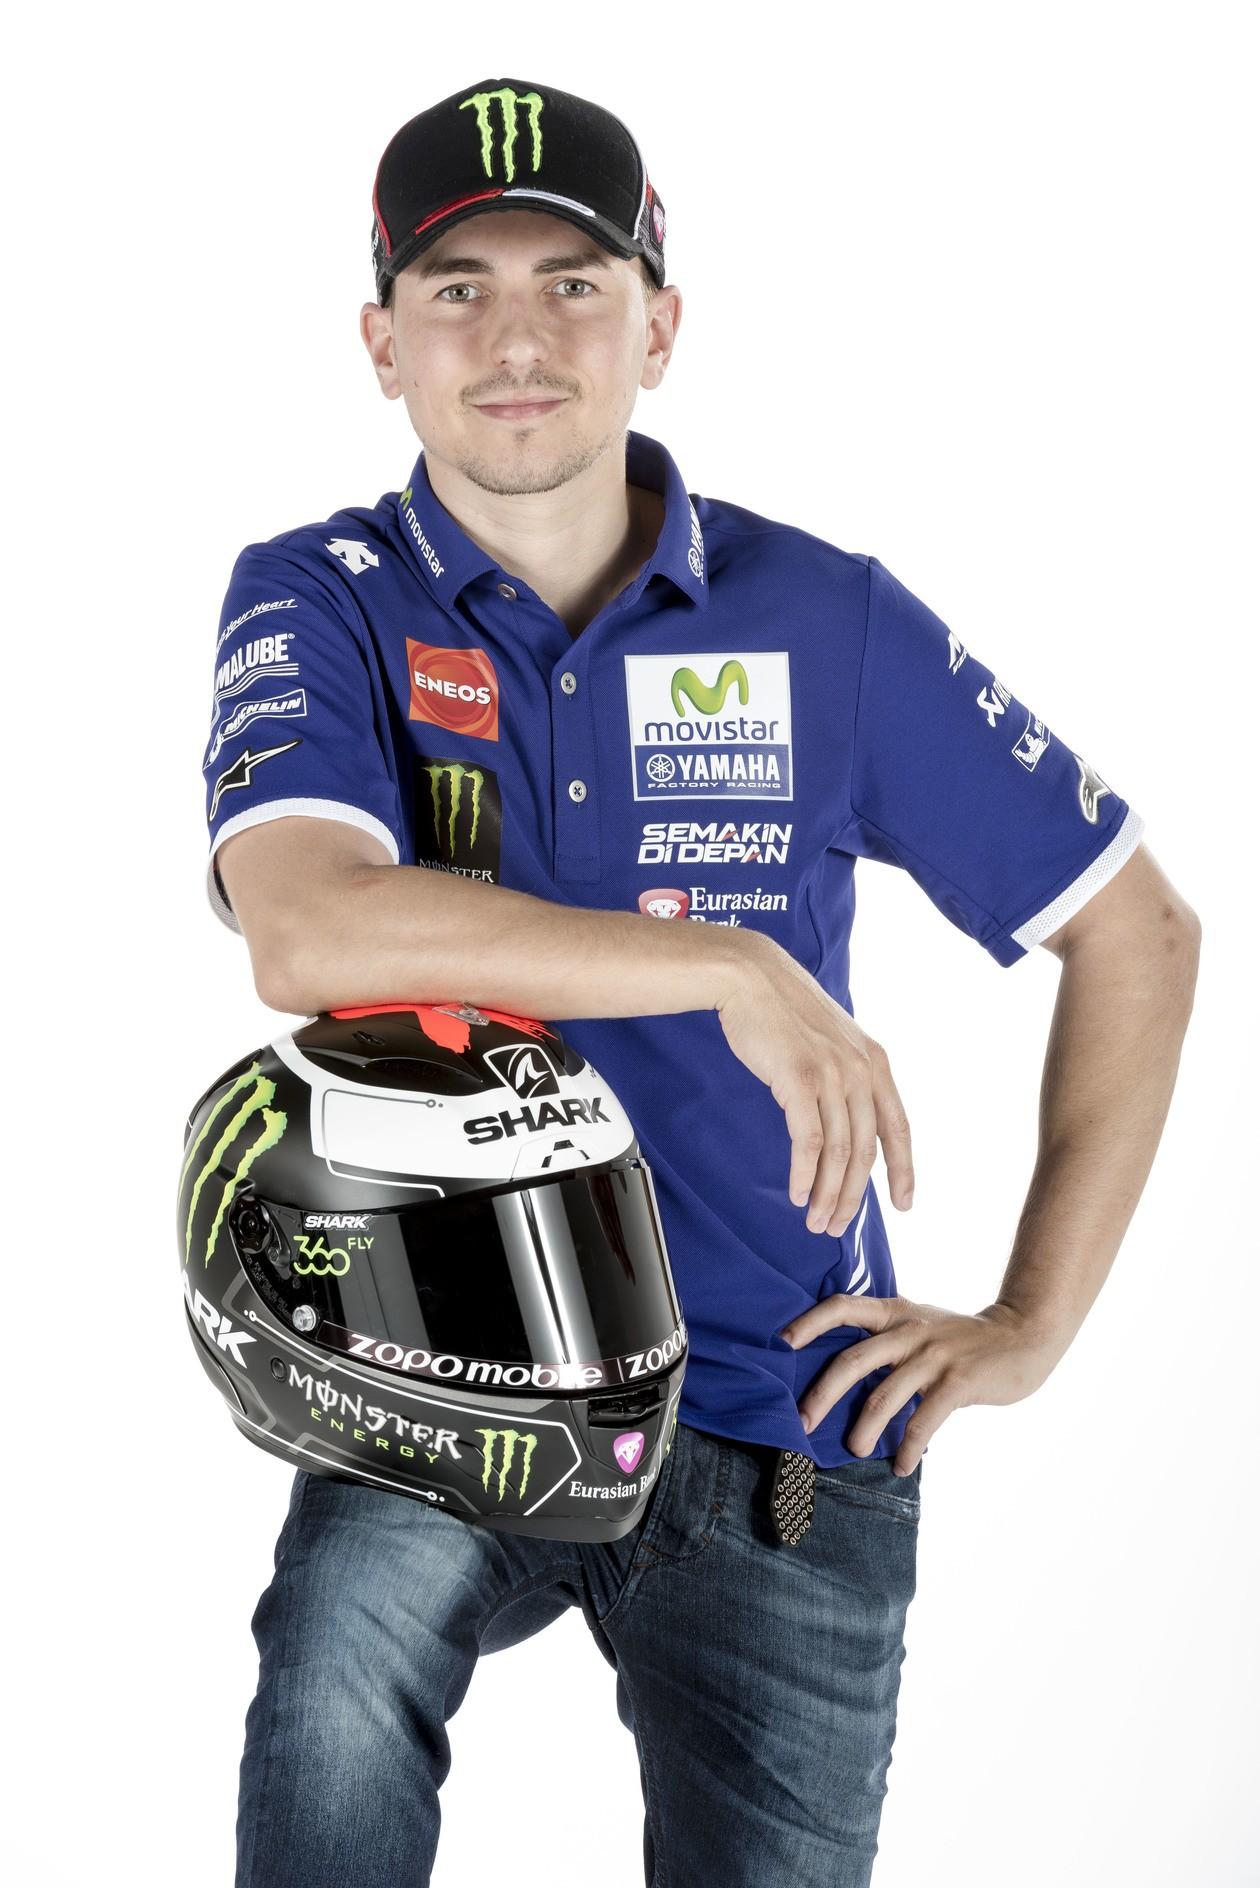 Yamaha Wishes Jorge Lorenzo a Happy Birthday on His 29th ...